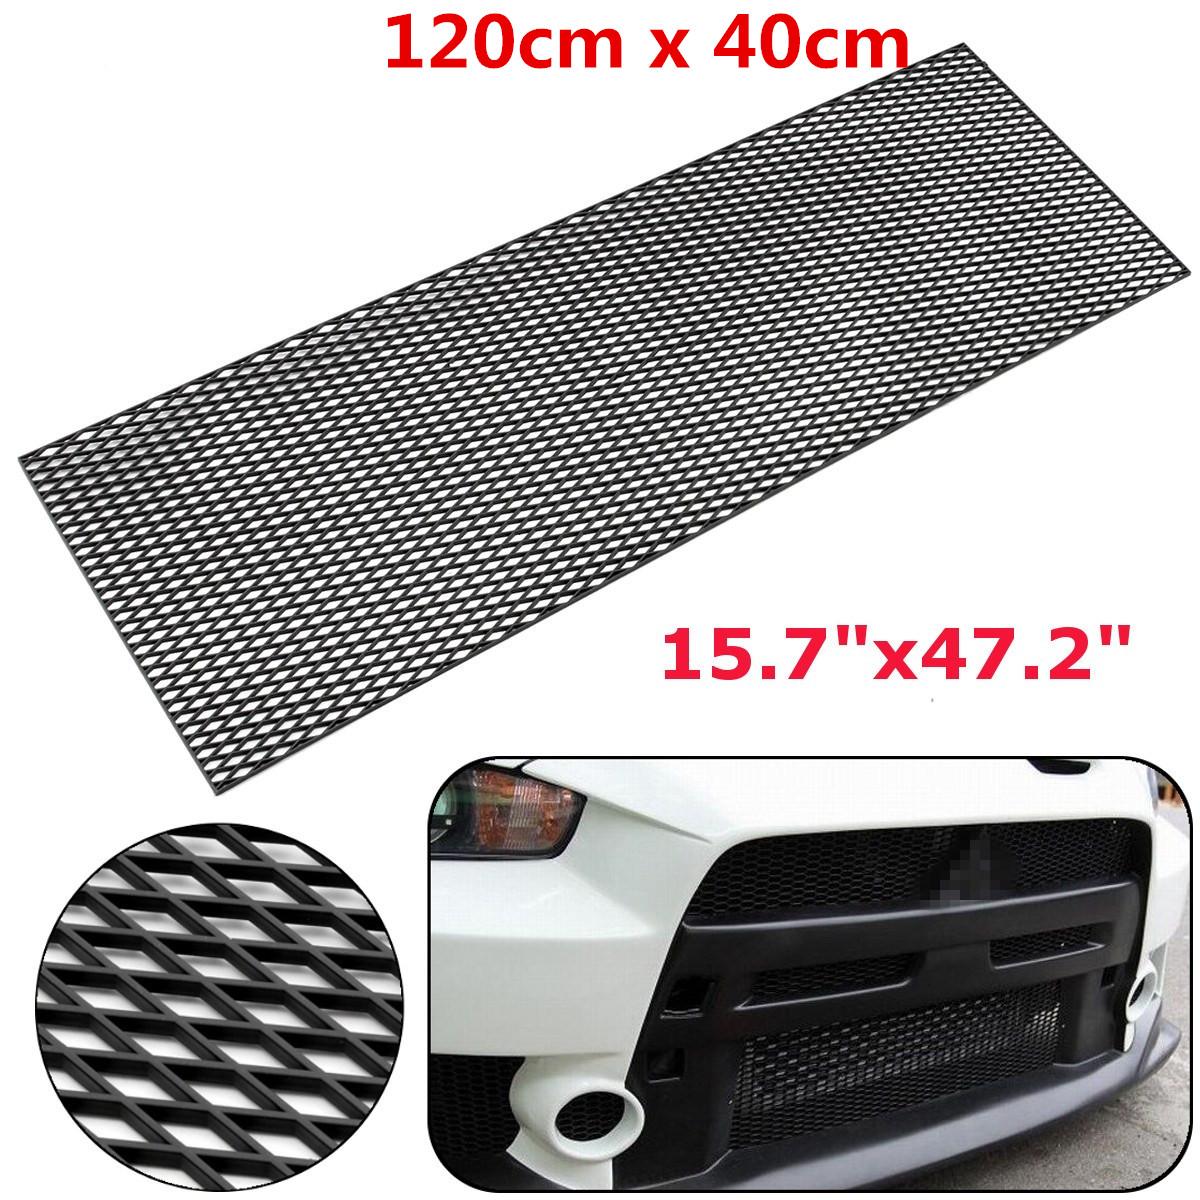 47.2''x15.7'' Black Honeycomb Mesh Grill ABS Plastic Spoiler Bumper Vent Side Vents Hoods Universal